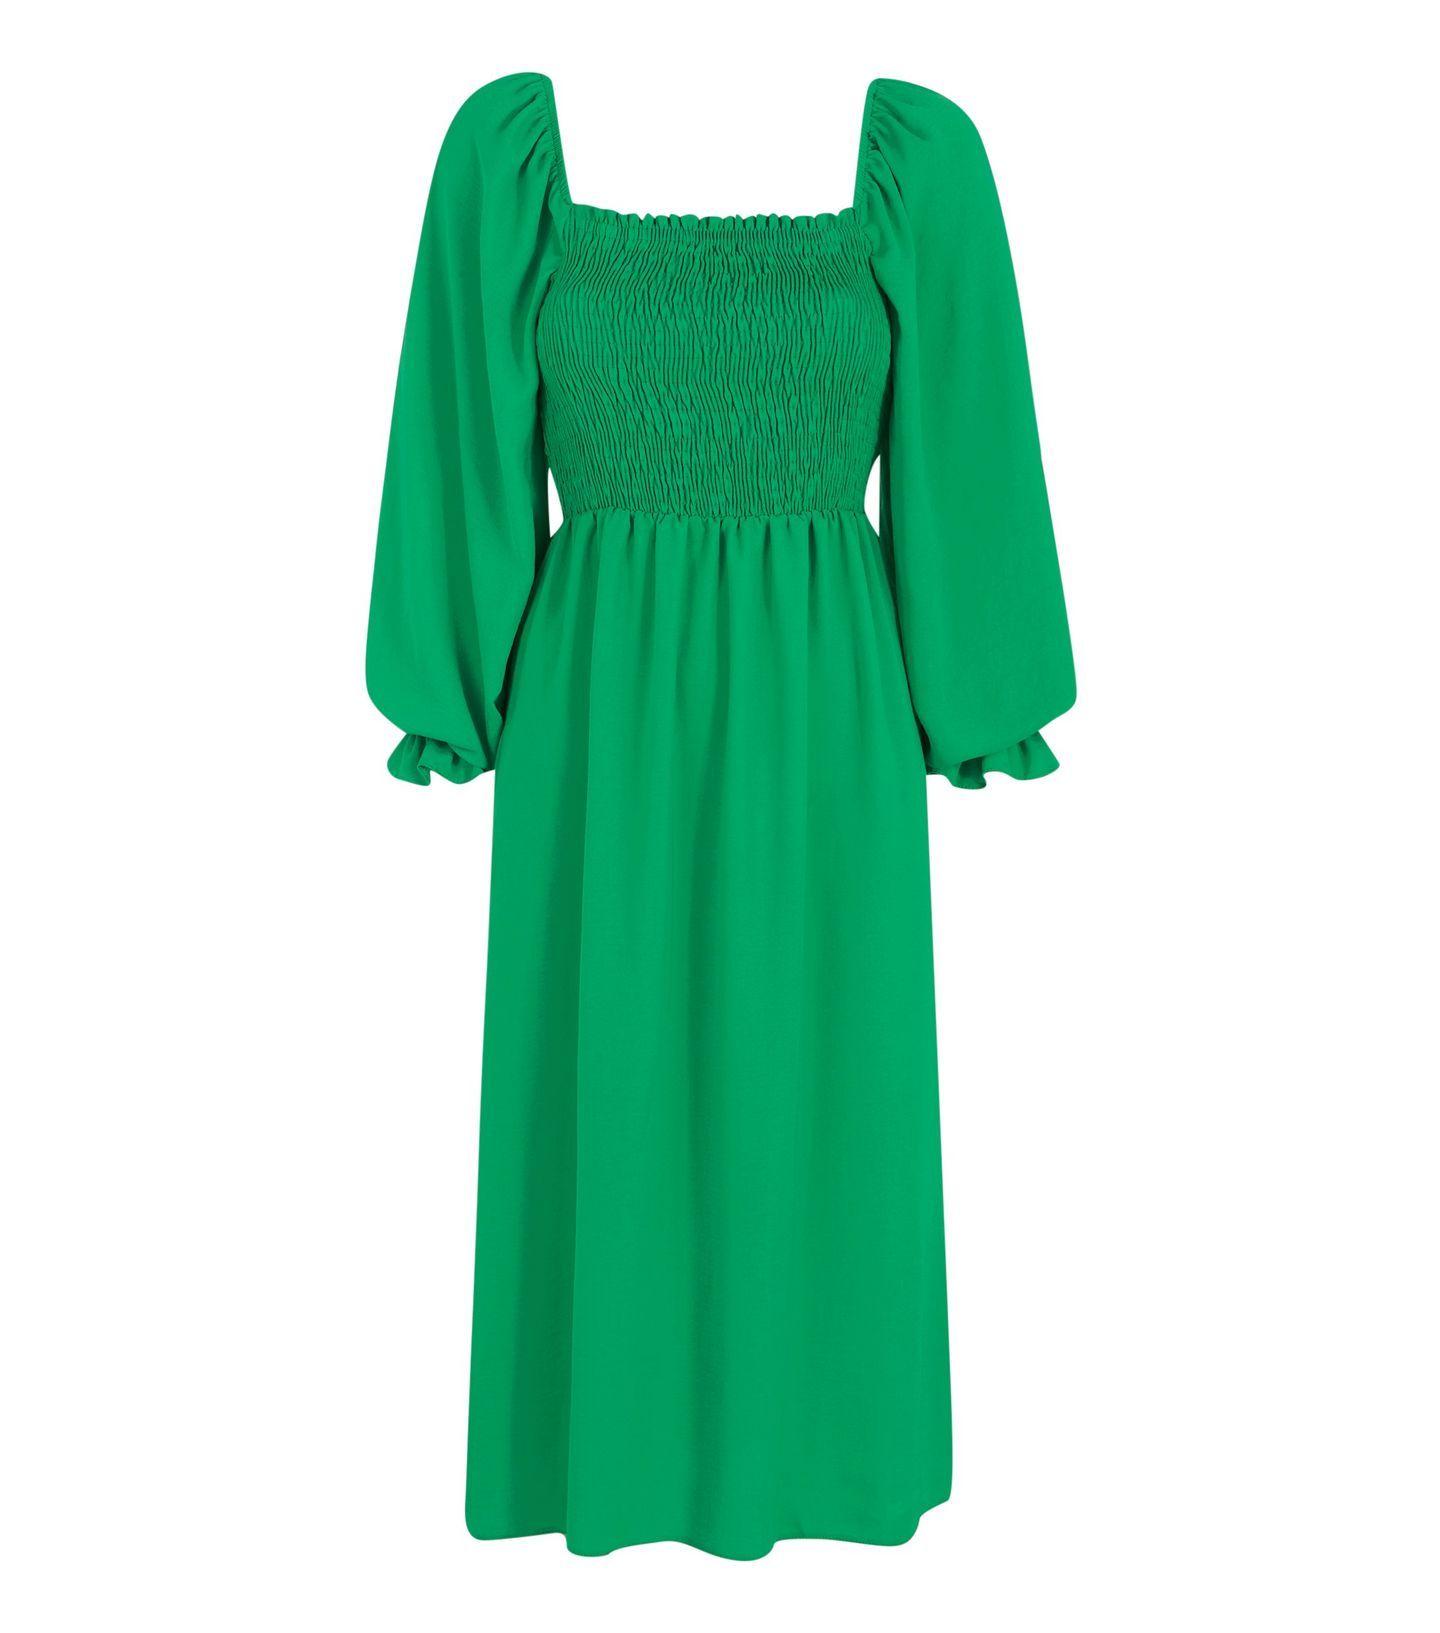 Black Shirred Square Neck Midi Dress New Look Midi Dress Dresses Green Midi Dress [ 1633 x 1440 Pixel ]